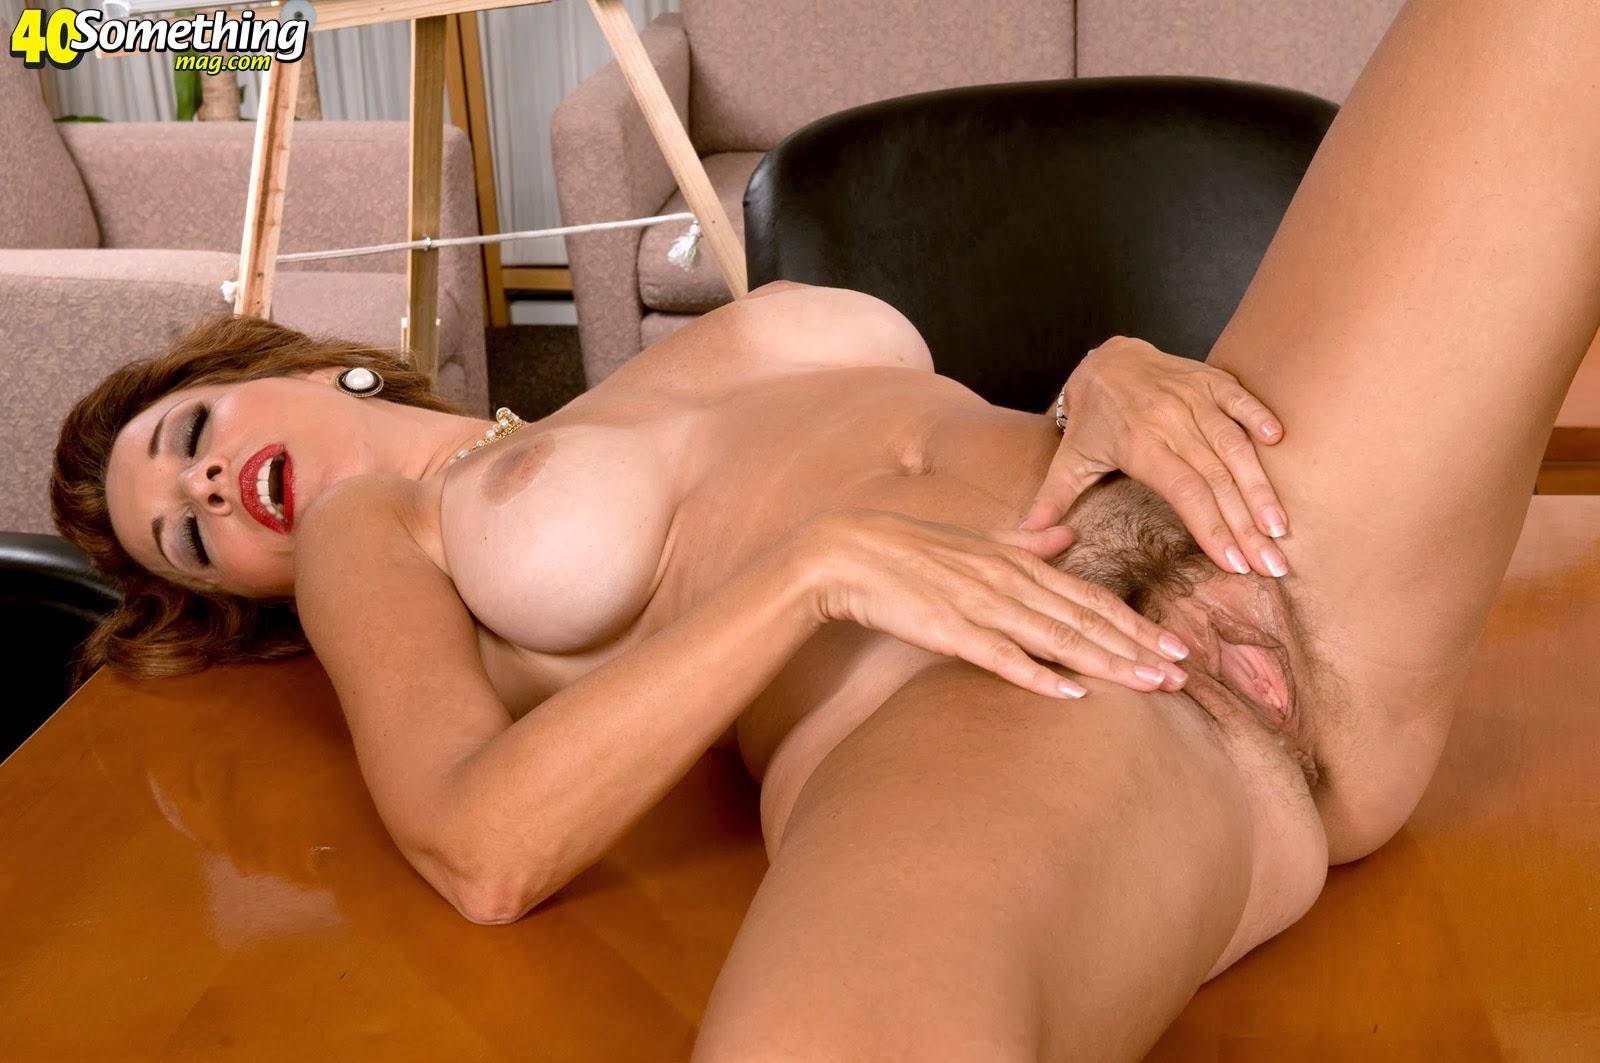 Gia giancarlo anal sex share